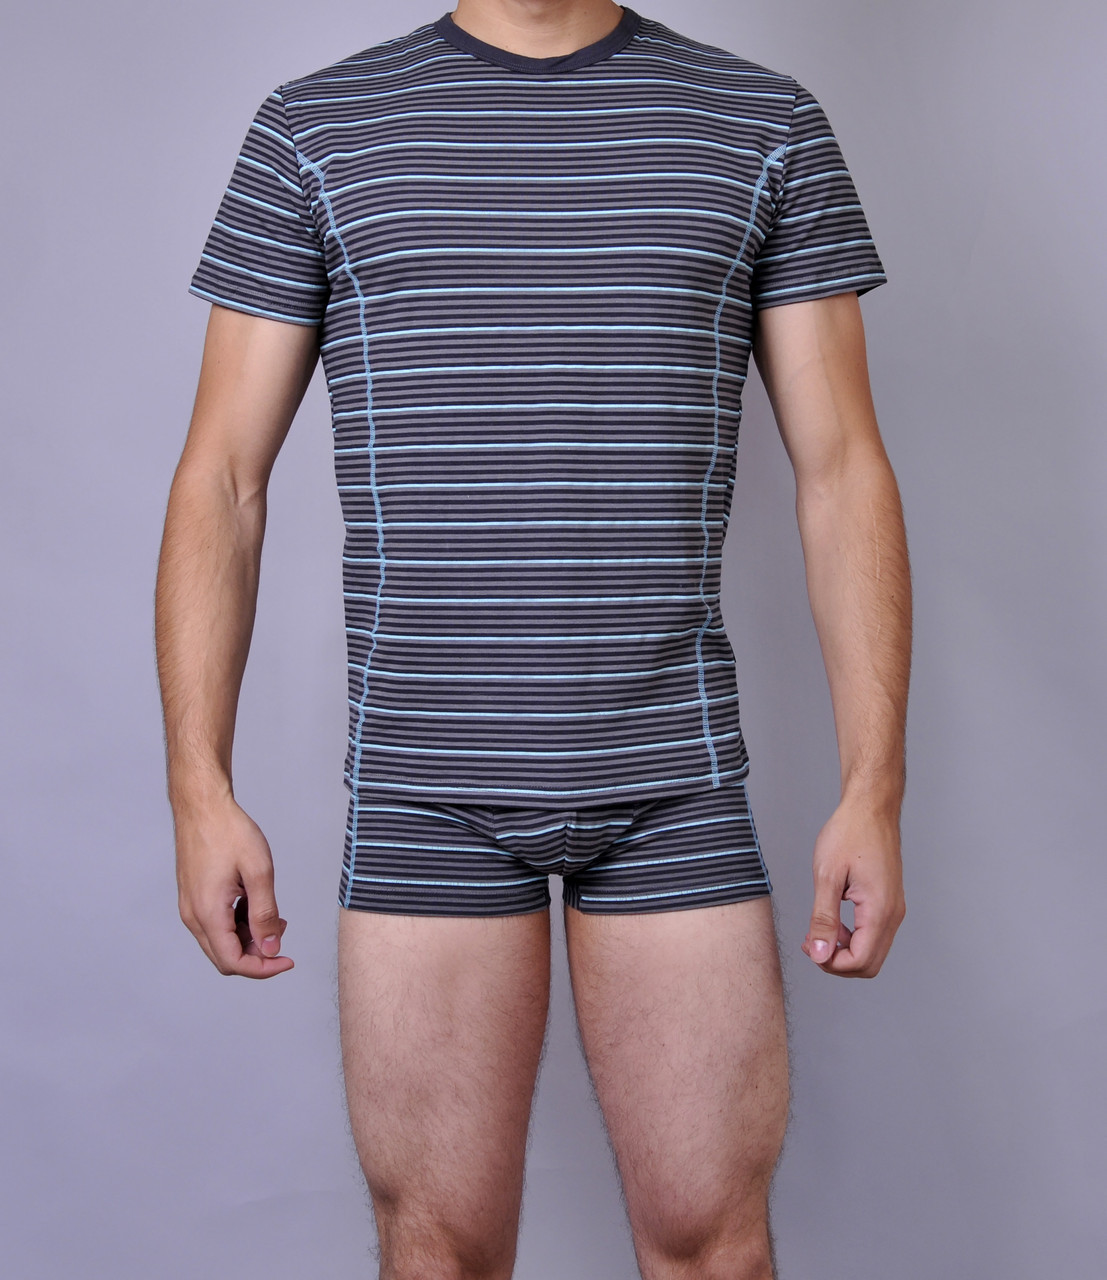 Мужская футболка  C+3 0115 XL Синий